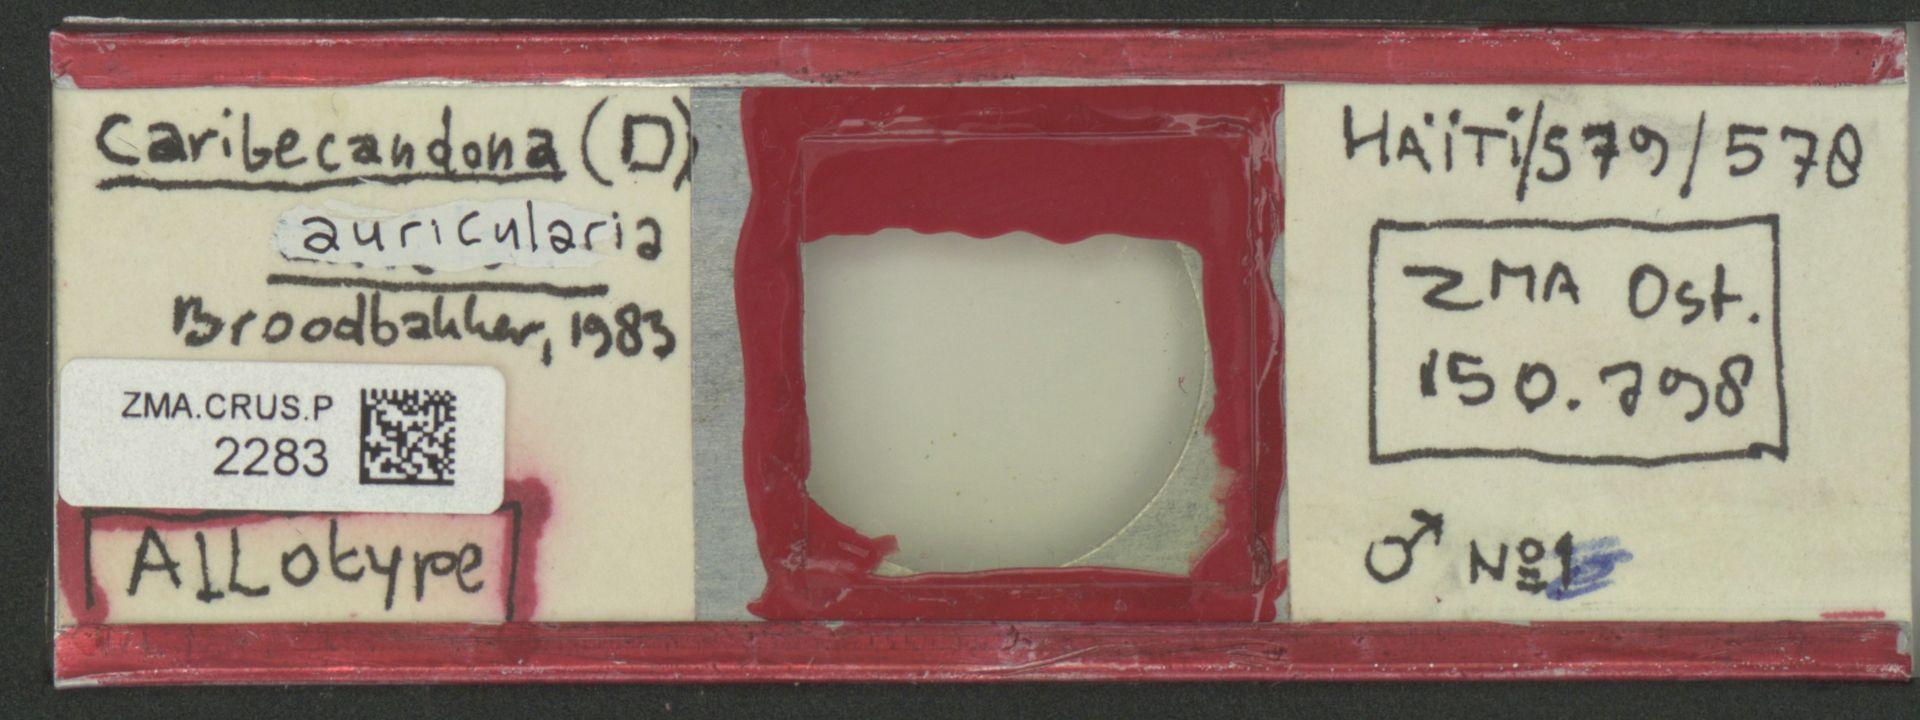 ZMA.CRUS.P.2283 | Caribecandona (D.) auricularia Broodbakker, 1983